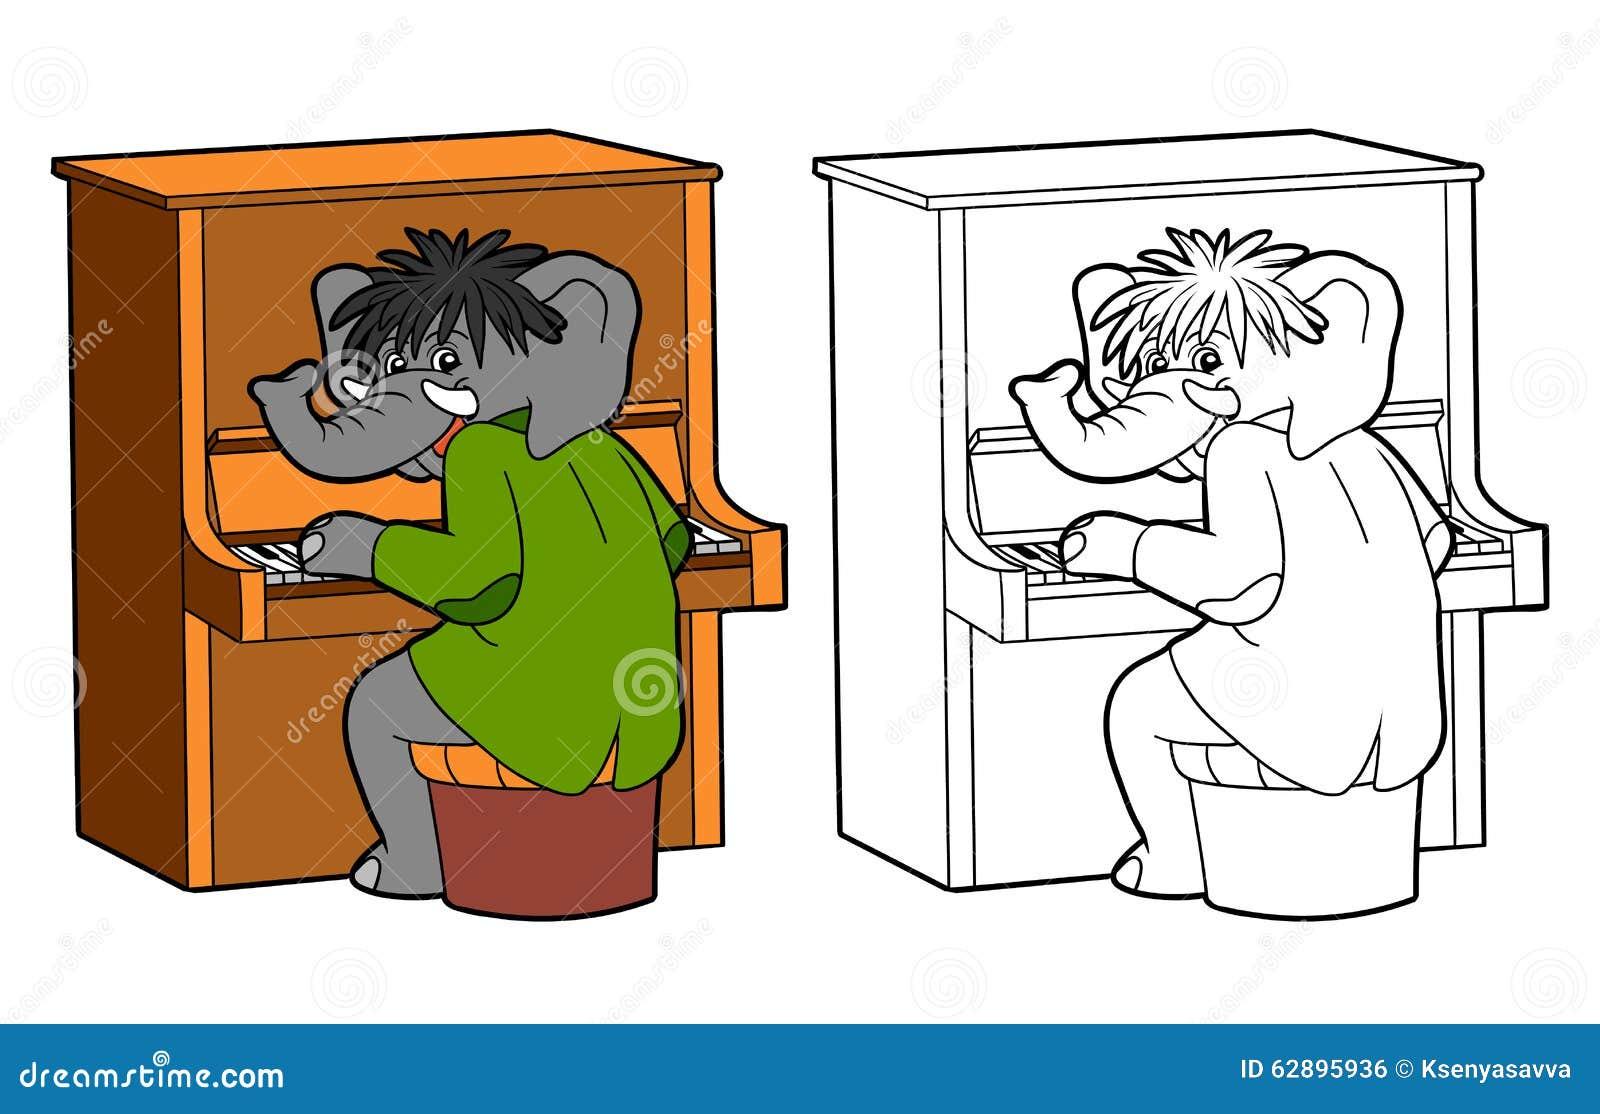 Hunde Super Fun Malbuch Serie Fur Kinder Erwachsene Download Choice ...